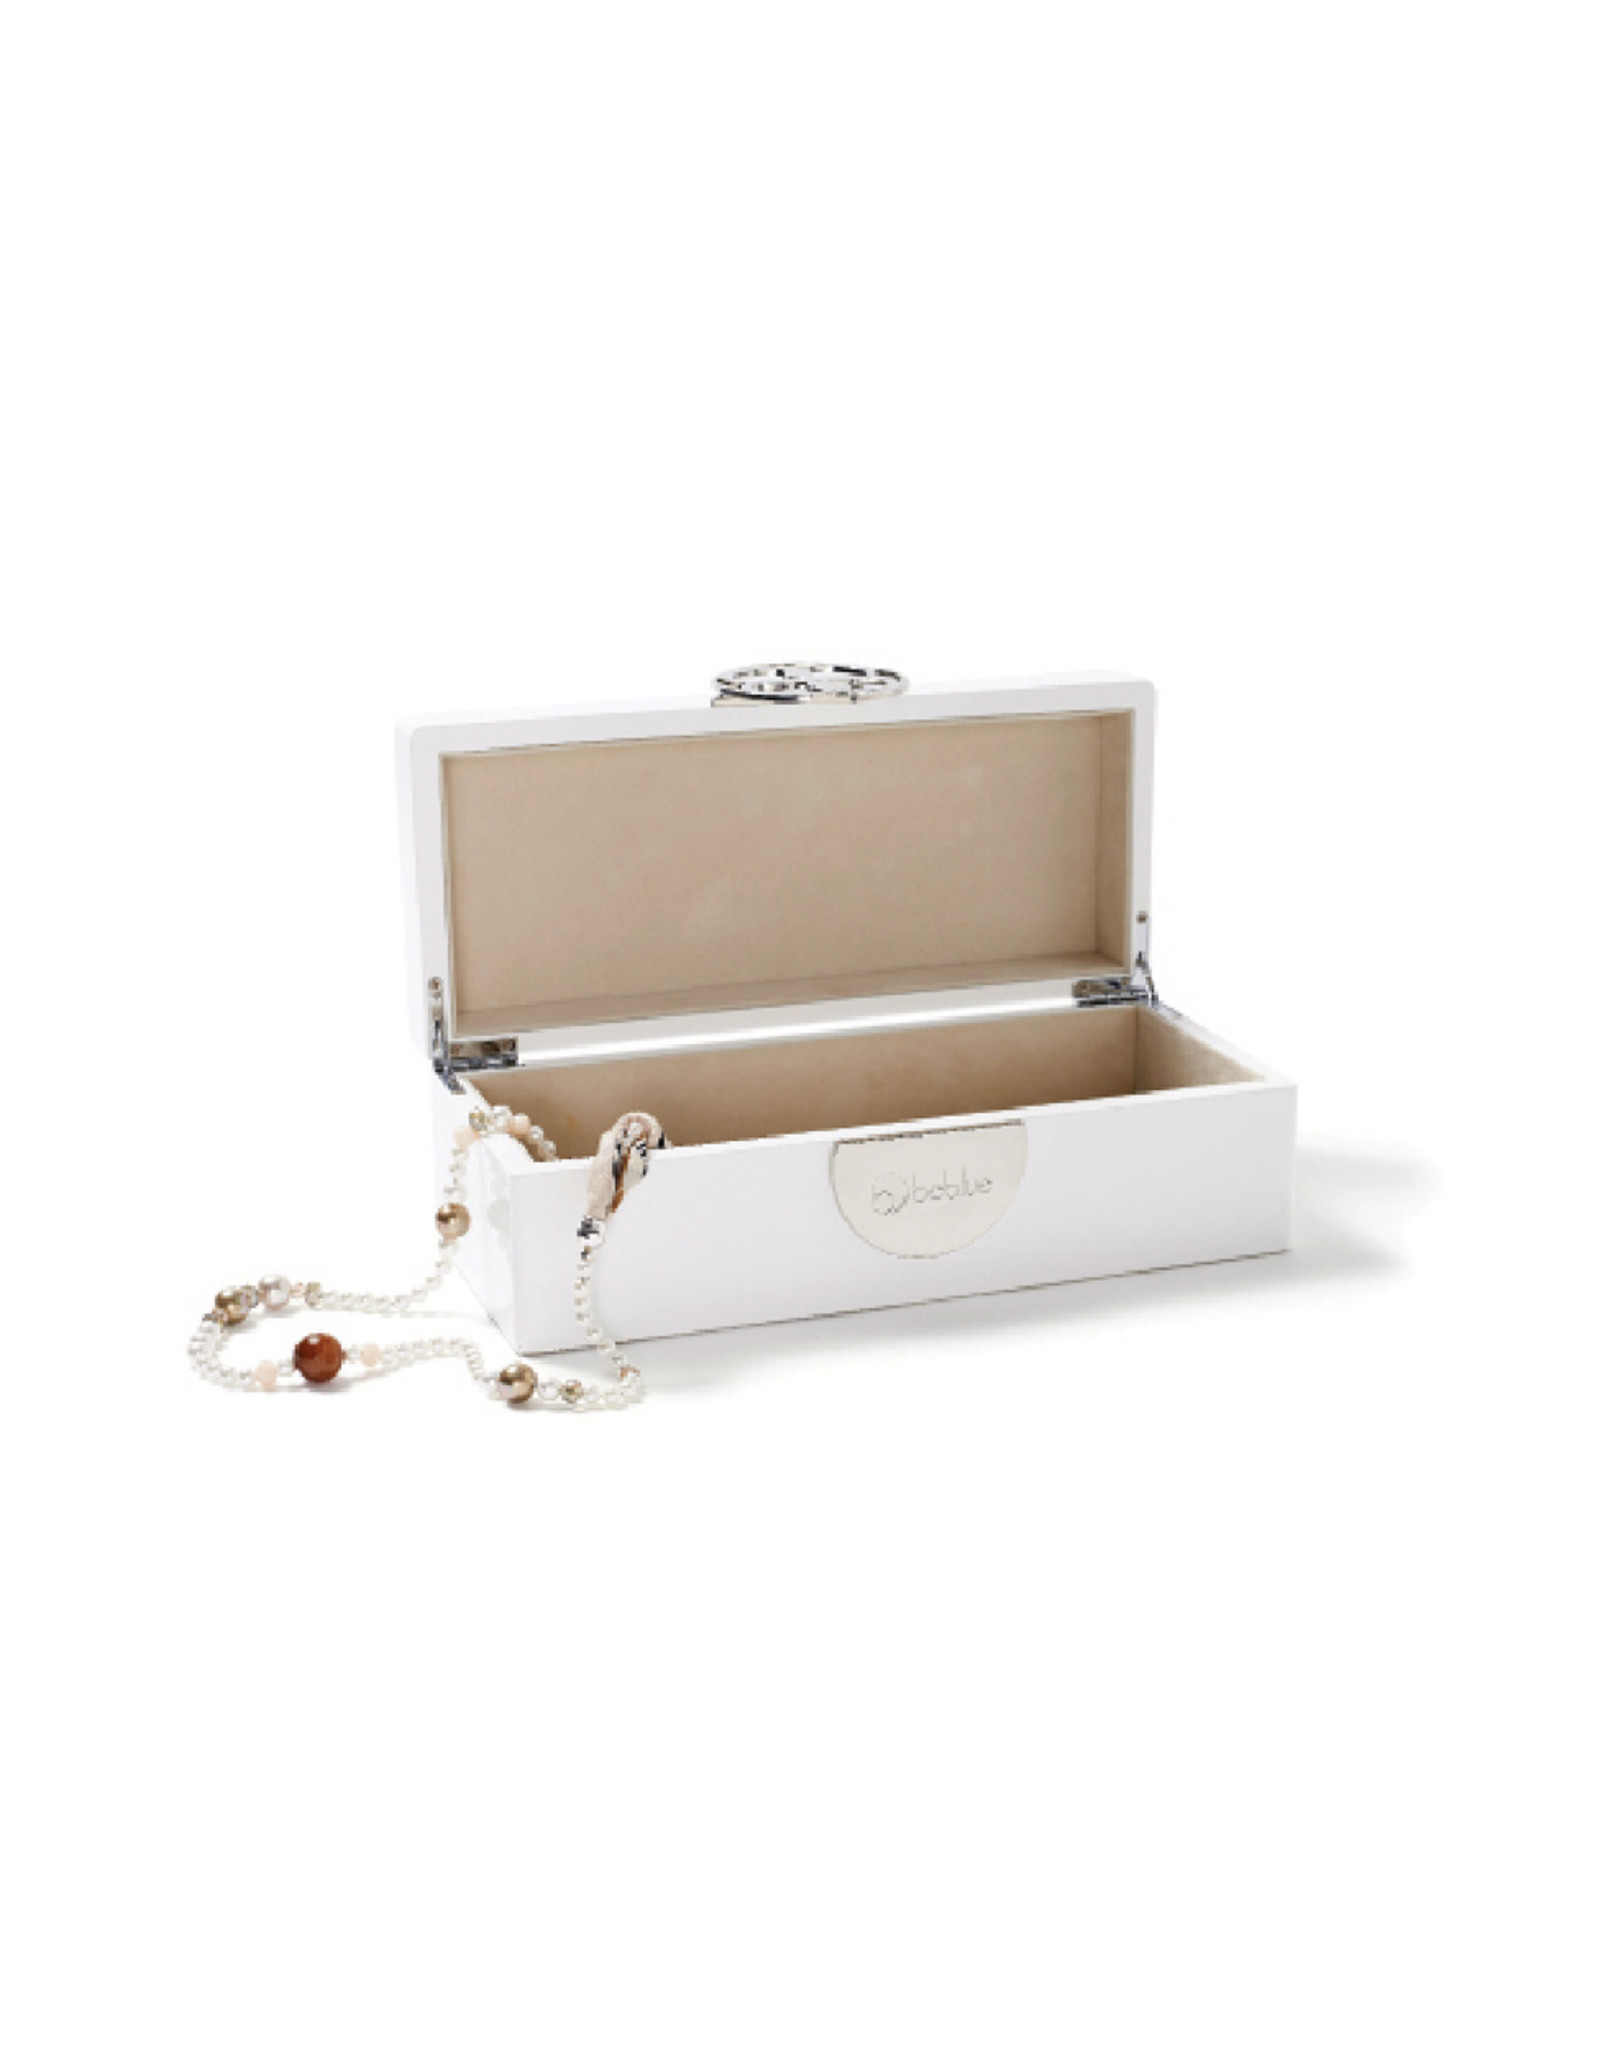 Beblue beblue Spirit Jewelry Box, White (BARCOFFRE-W)